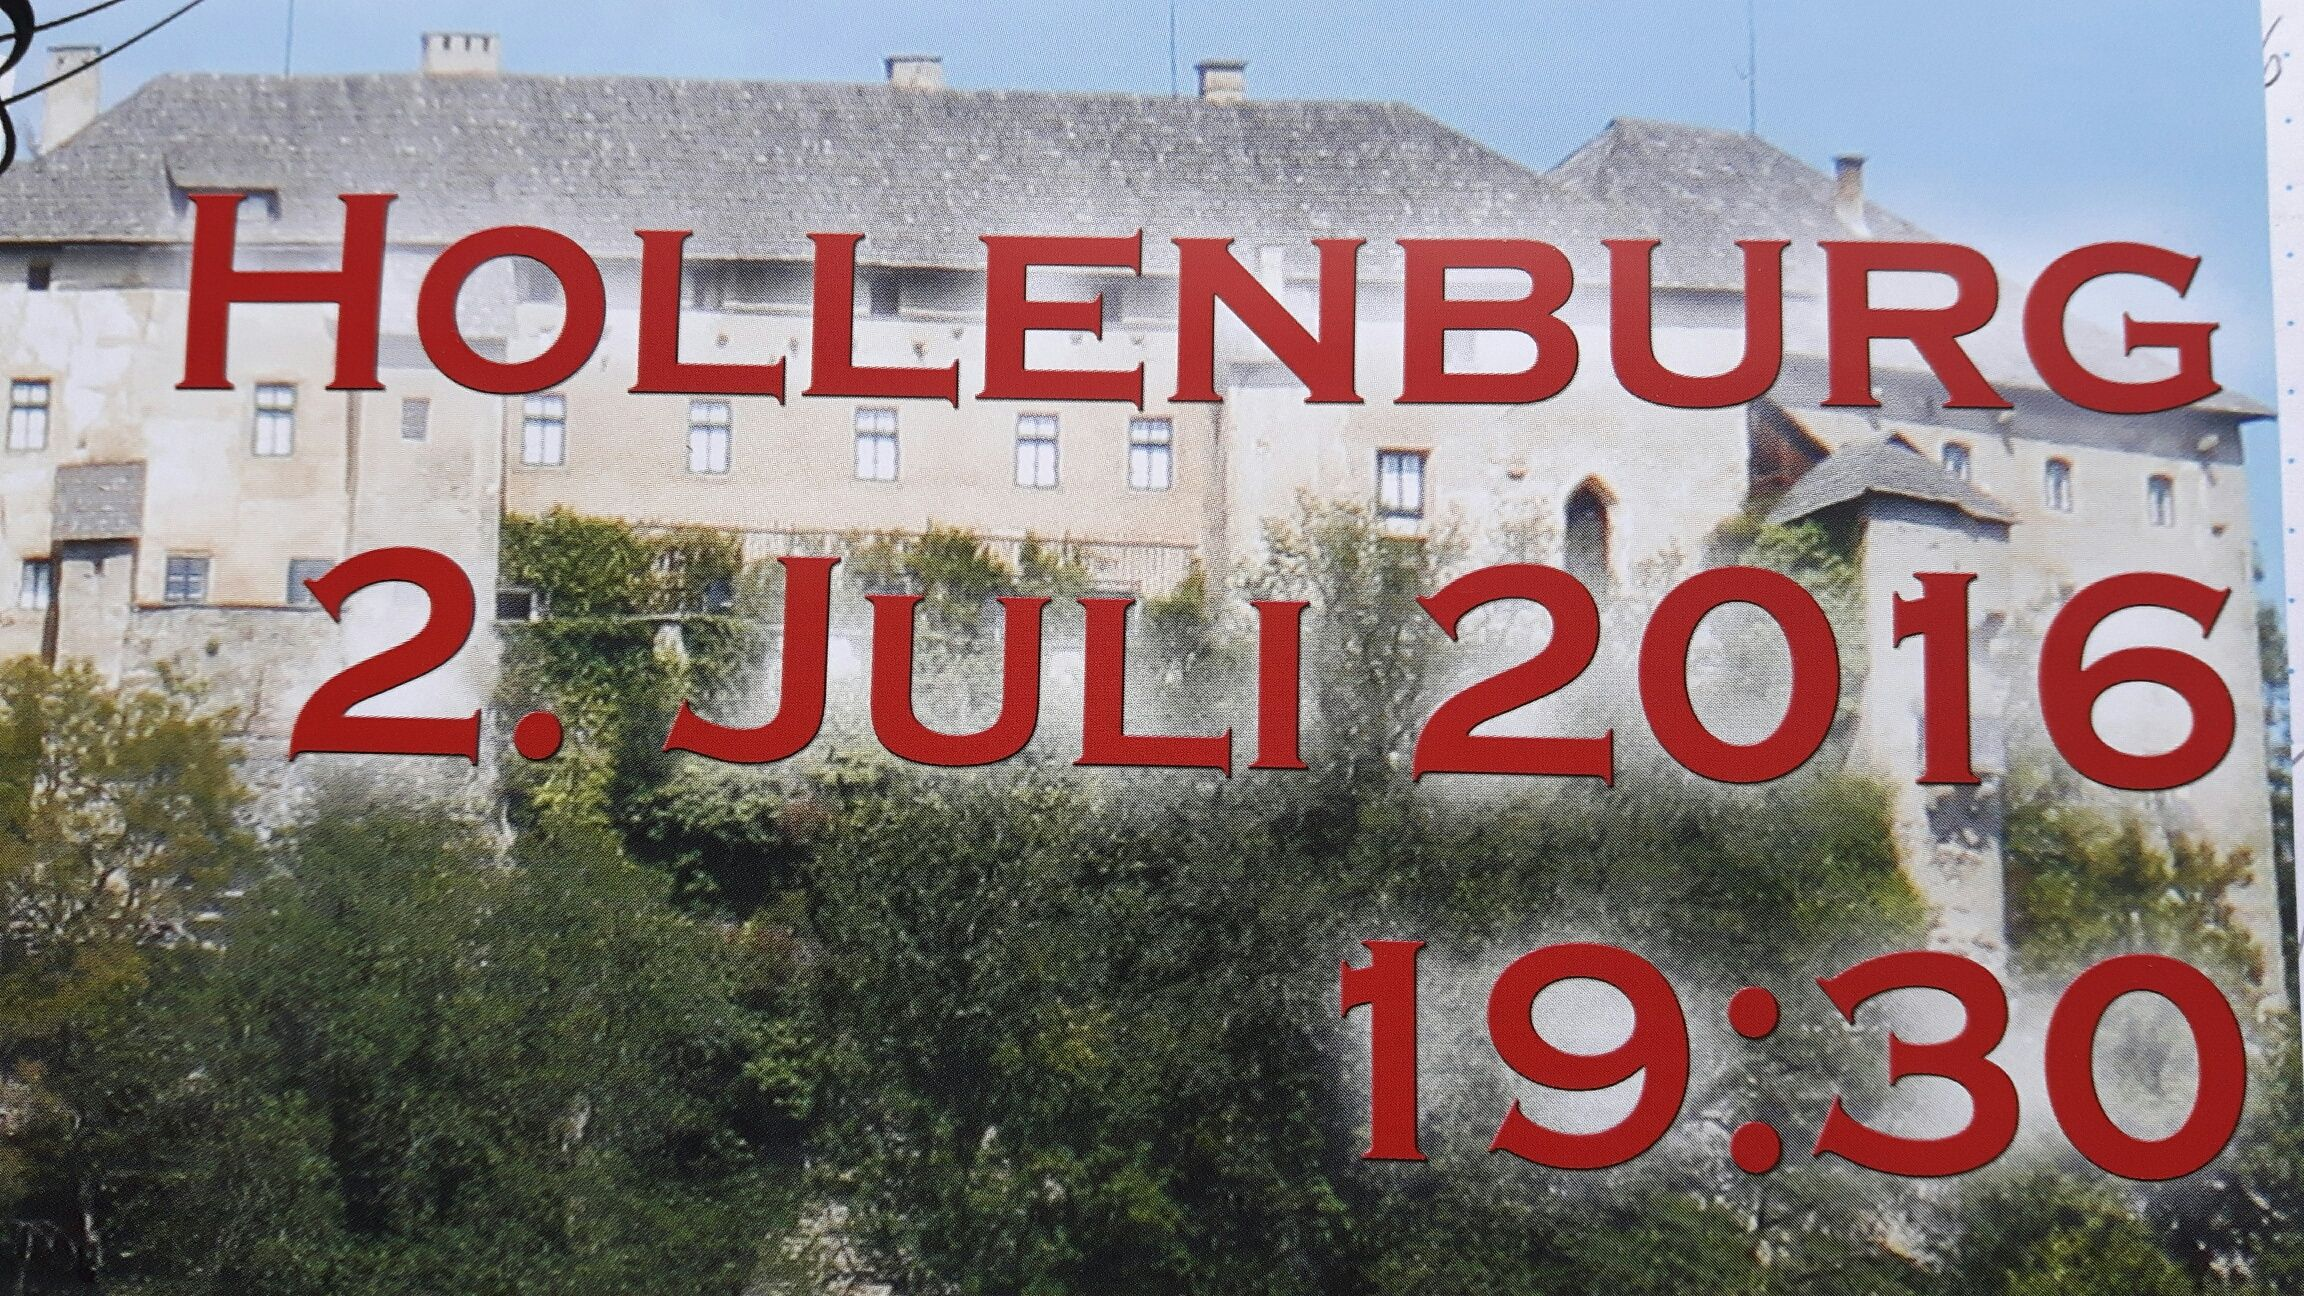 02.07.2016 - Burghofsingen Hollenburg um 19:30 Uhr